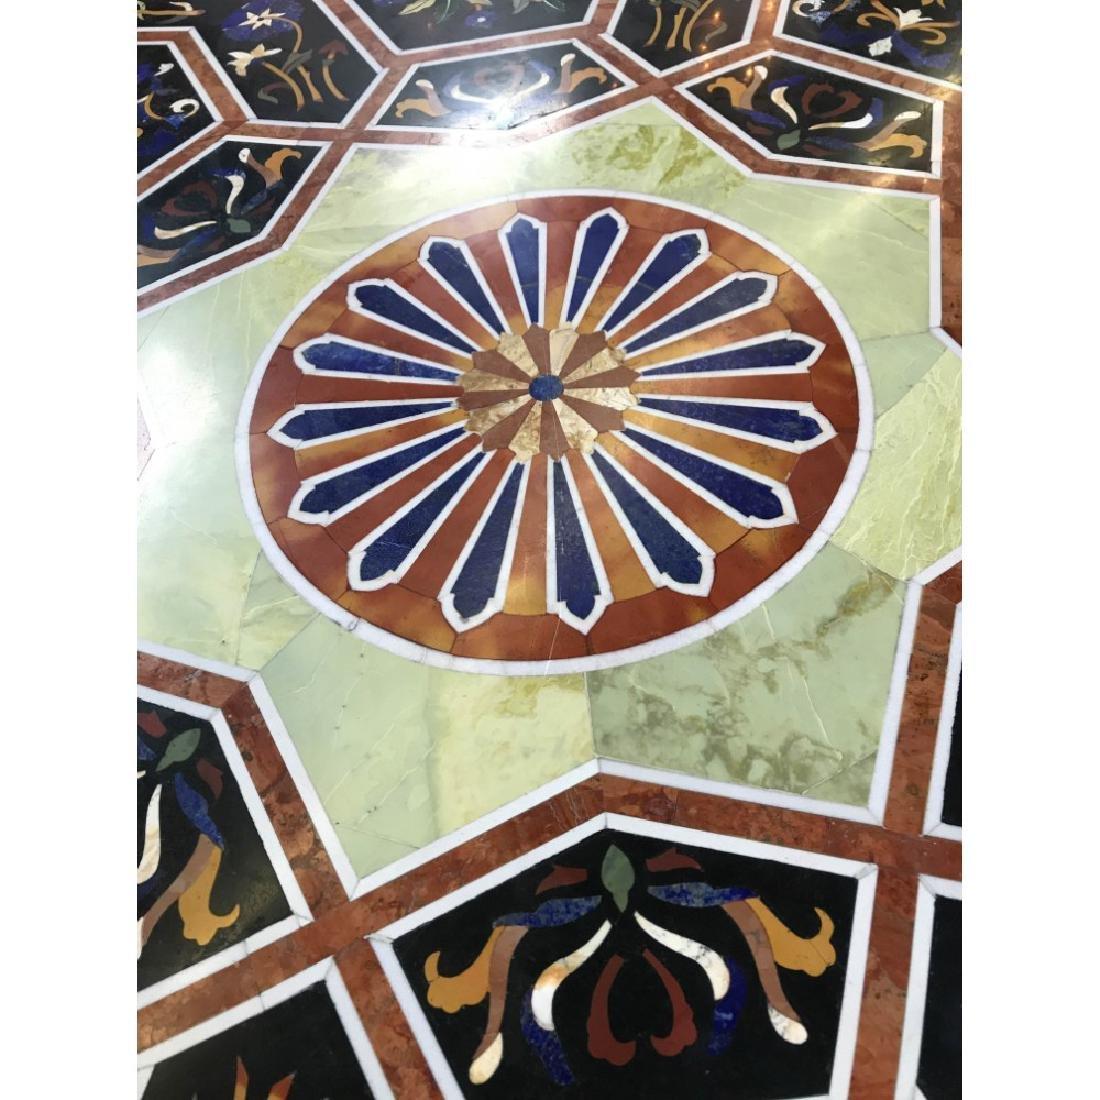 Mosaic Pietra Dura Octagon-Shaped Table - 7